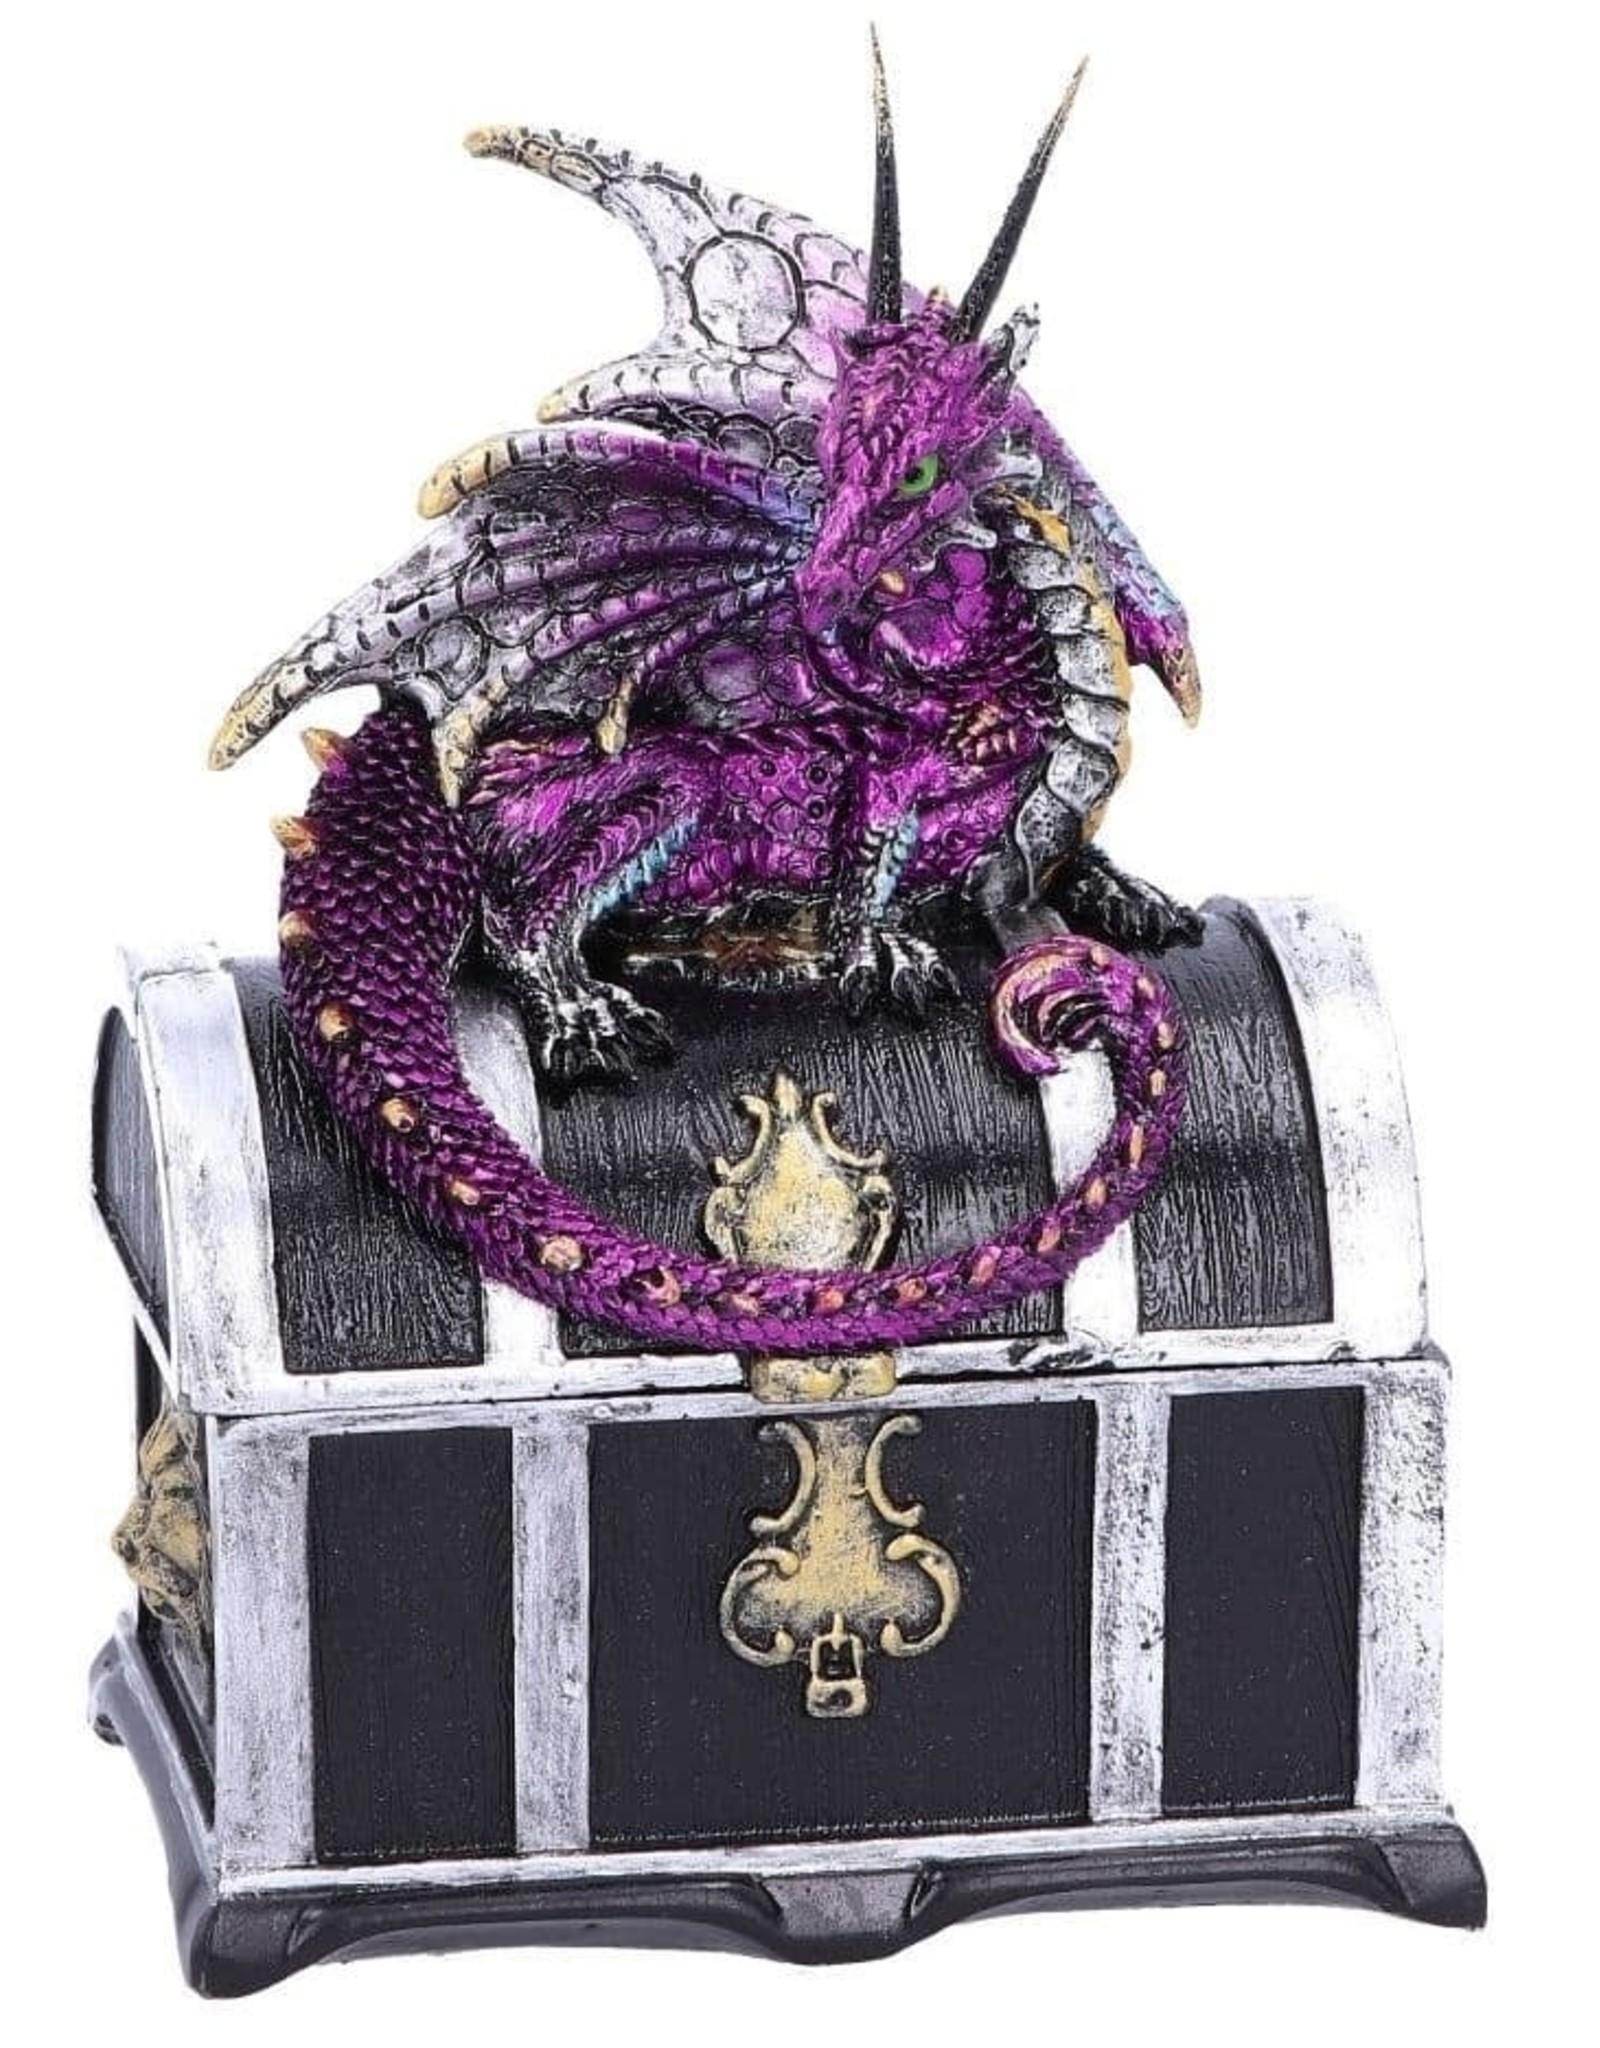 Alator Gothic en Steampunk accessoires - Schatkist met paarse draak er op - Reptillian Riches - Nemesis Now